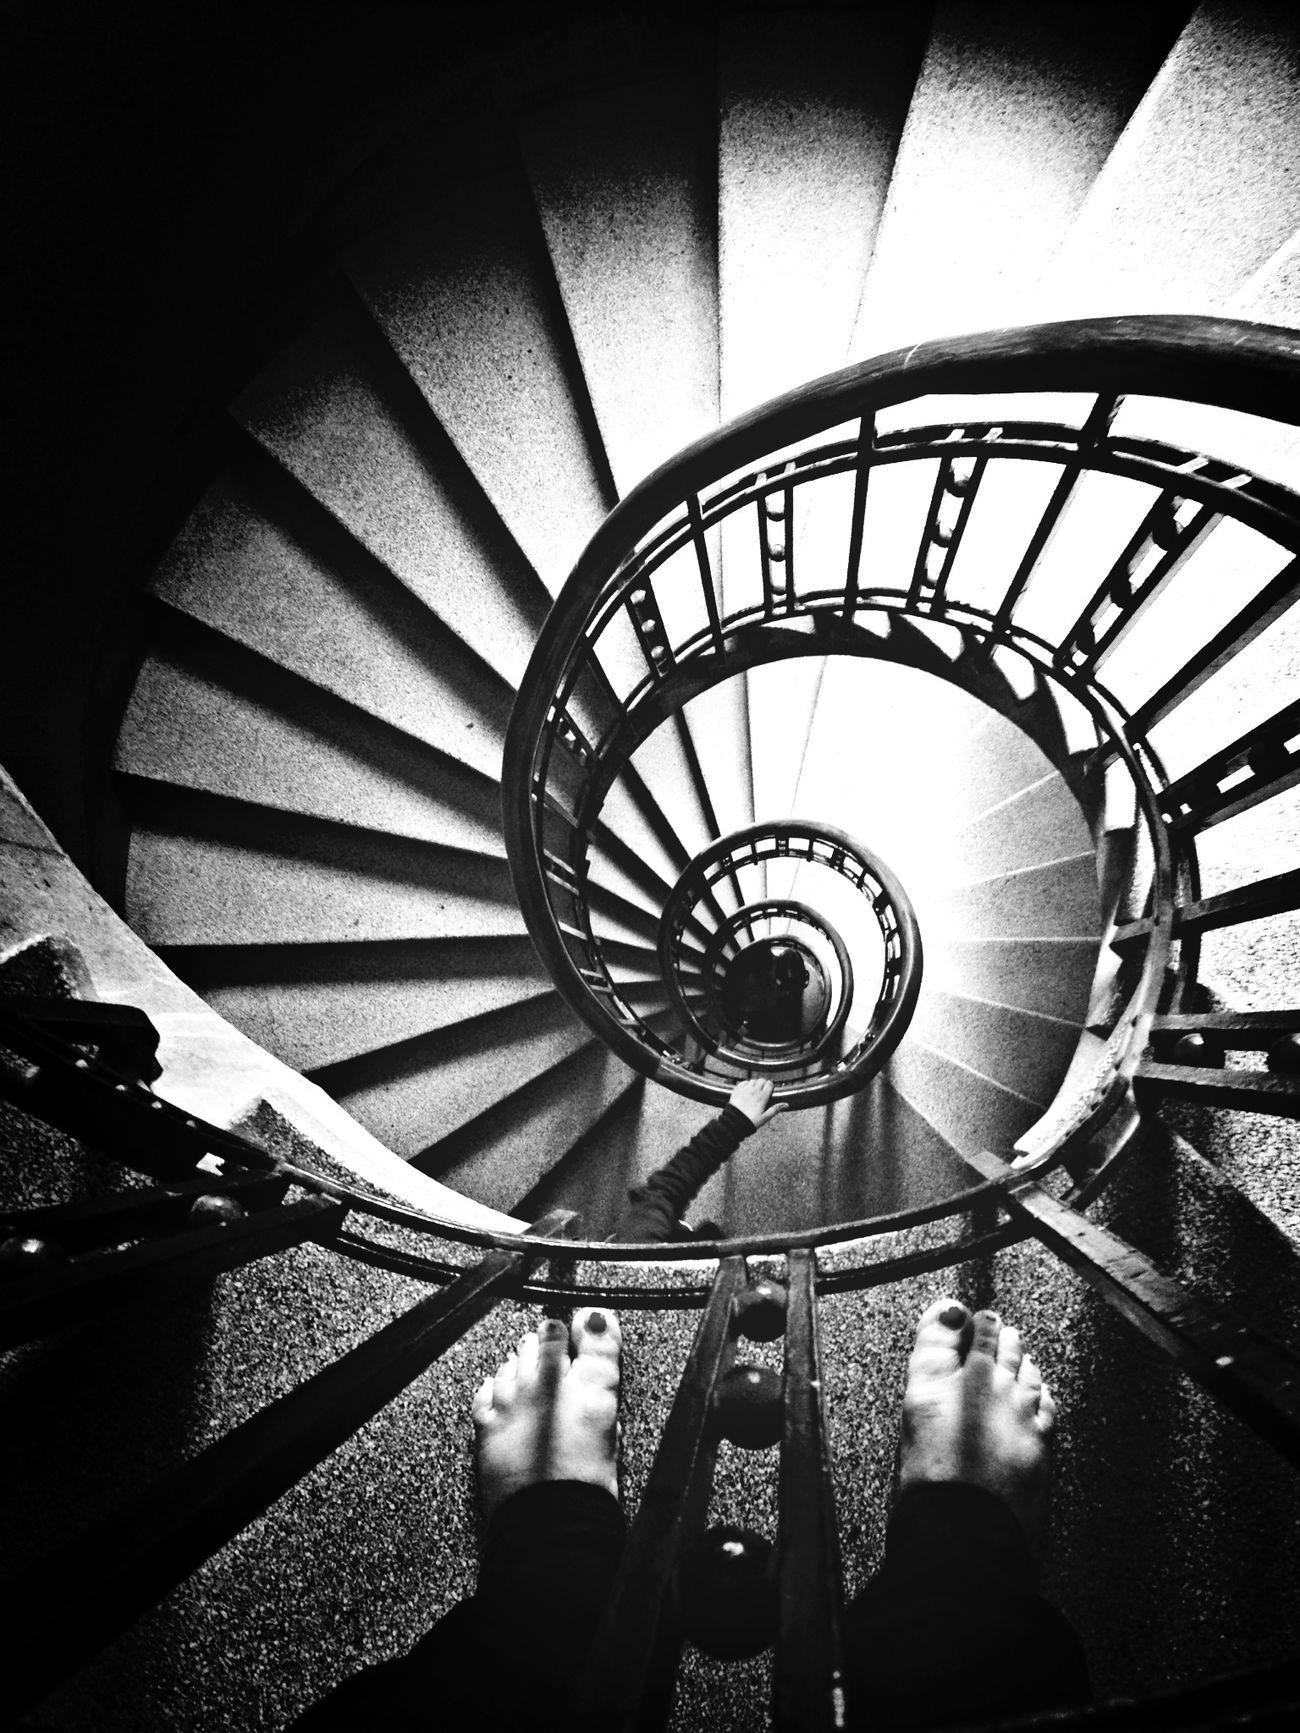 monter jusque chez moi n'est pas une sinecure ;) Blackandwhite Bnw Stairs